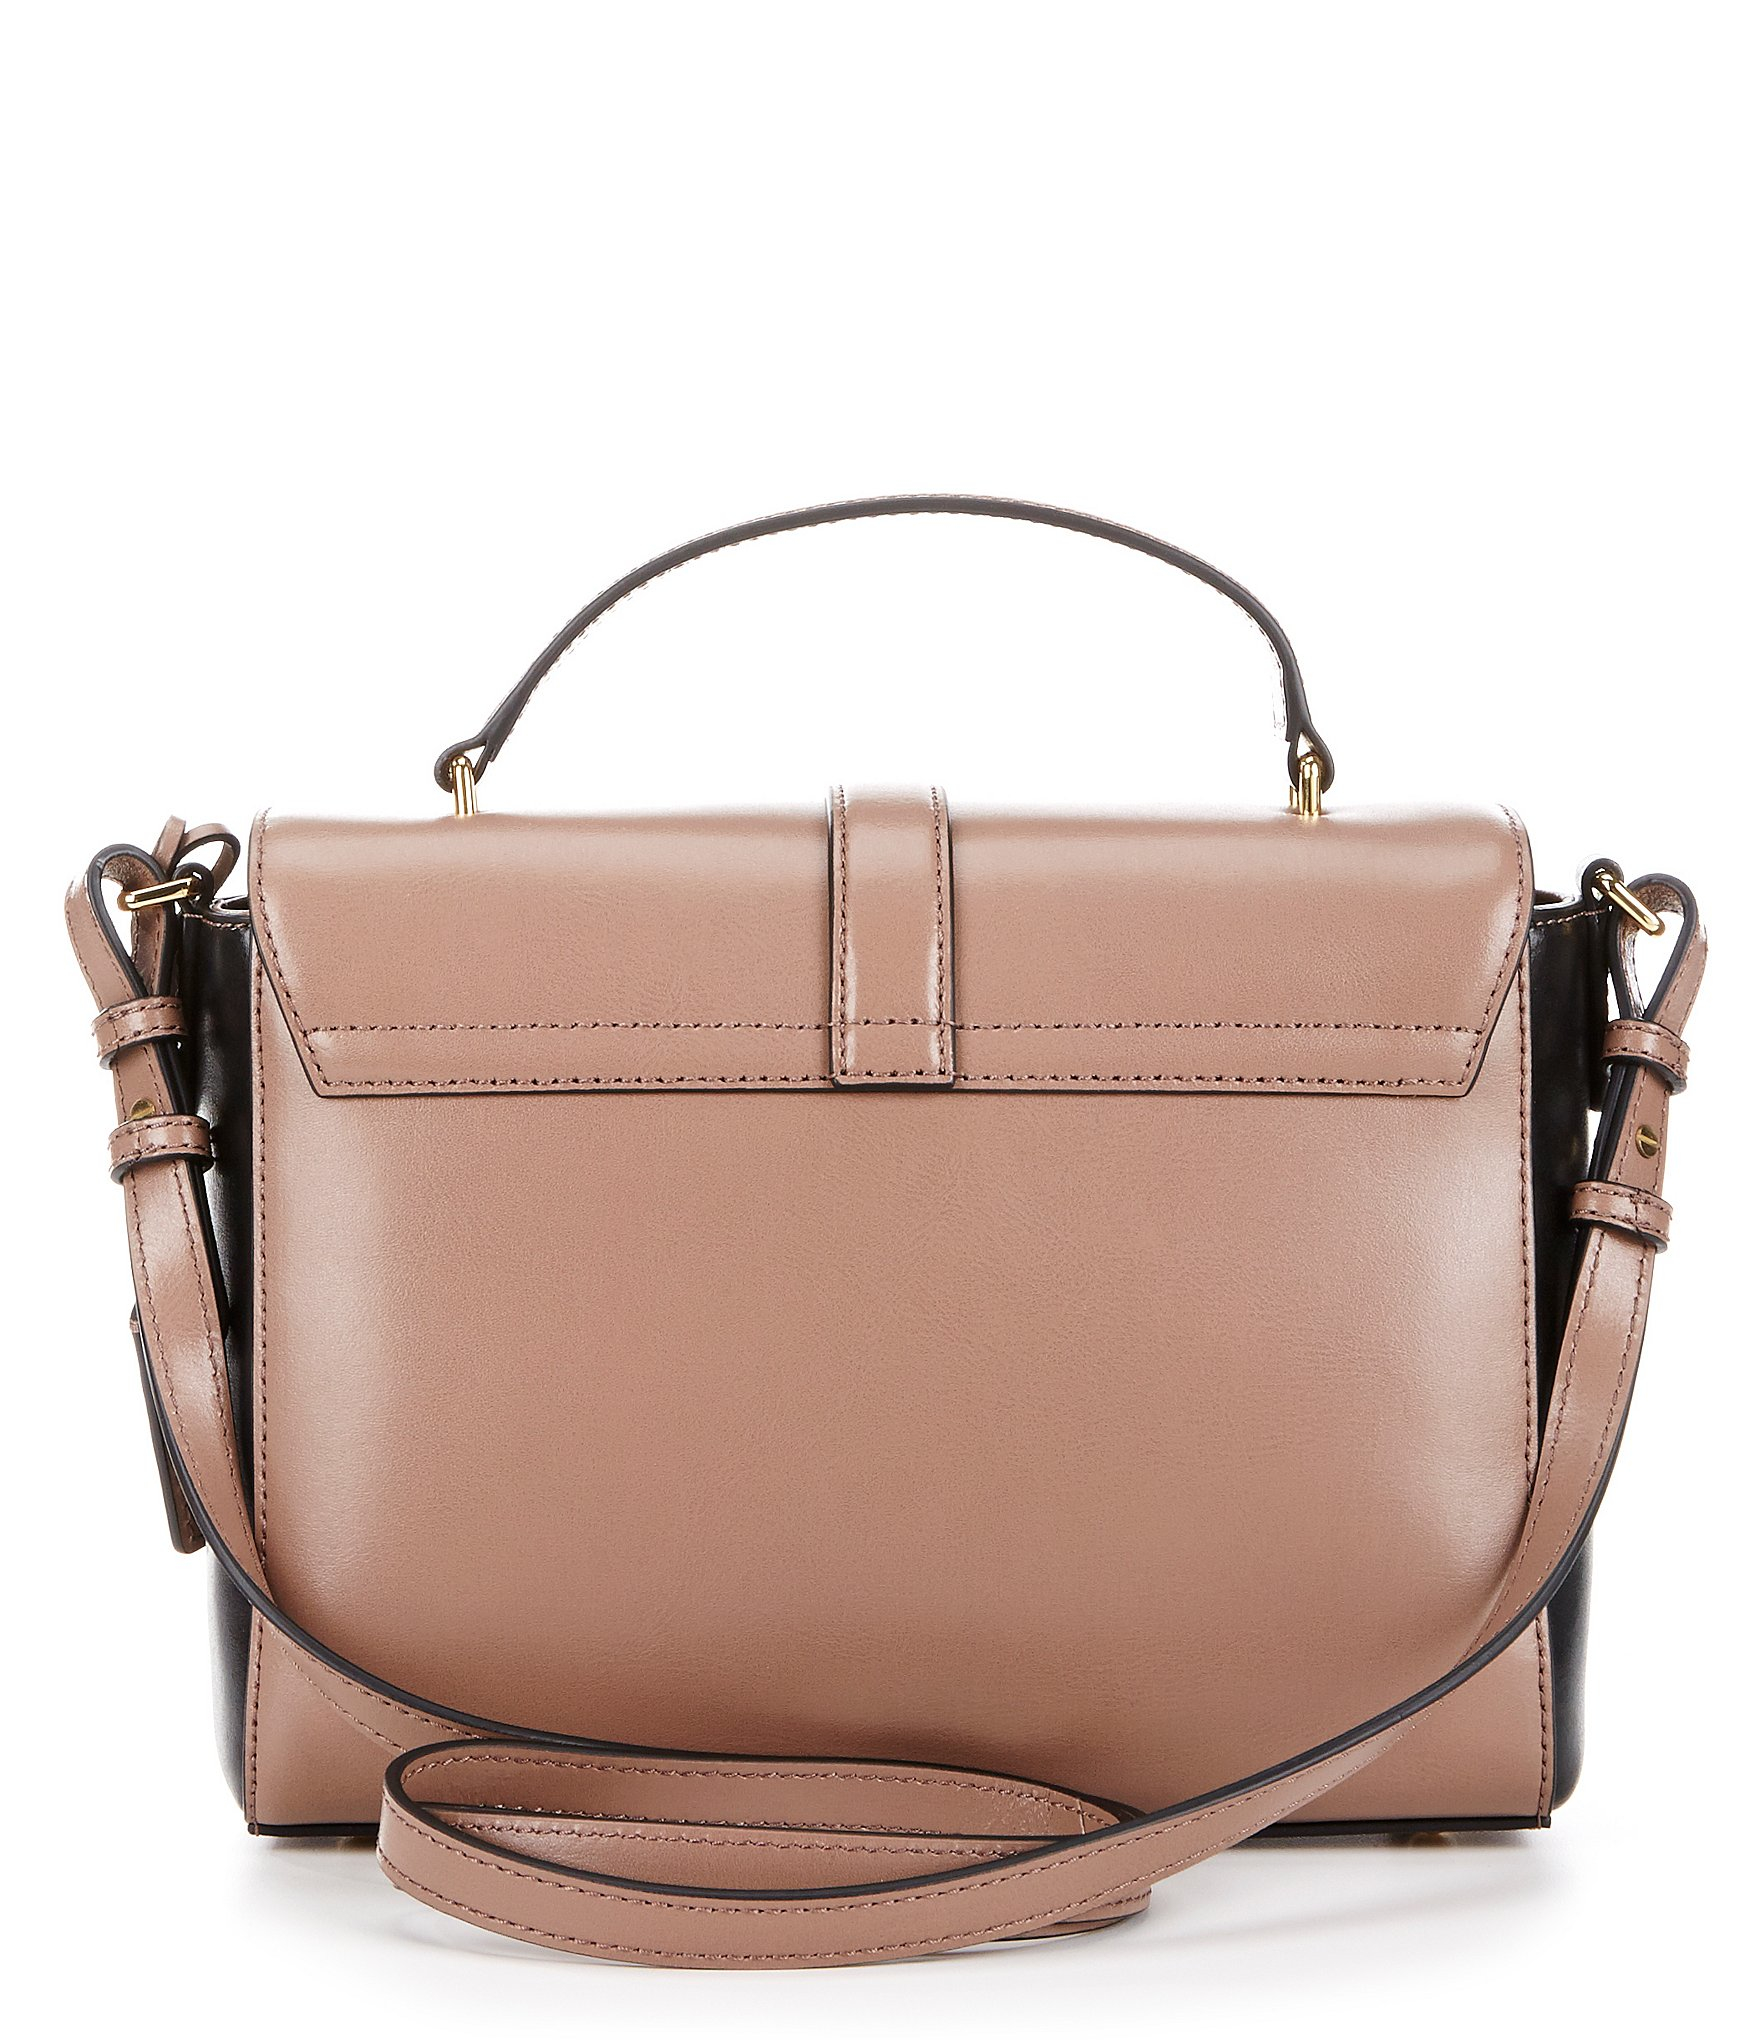 65a5941d75b Lauren by Ralph Lauren Pink Winston Collection Raquel Top-handle Messenger  Bag